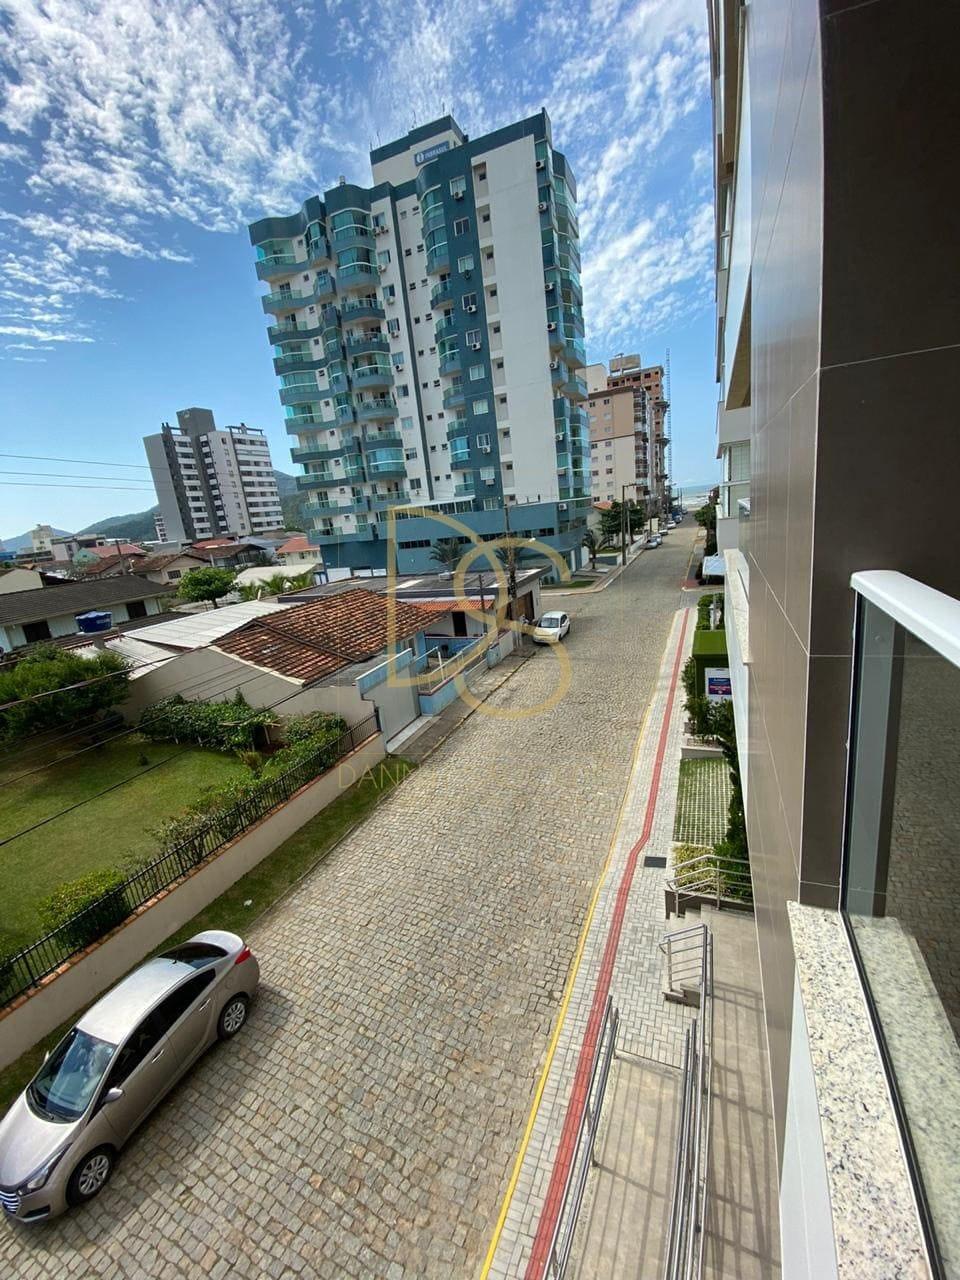 https://static.arboimoveis.com.br/AP0070_DANS/apartamentoavendagravatanavegantessc_1614602835891_watermark.png